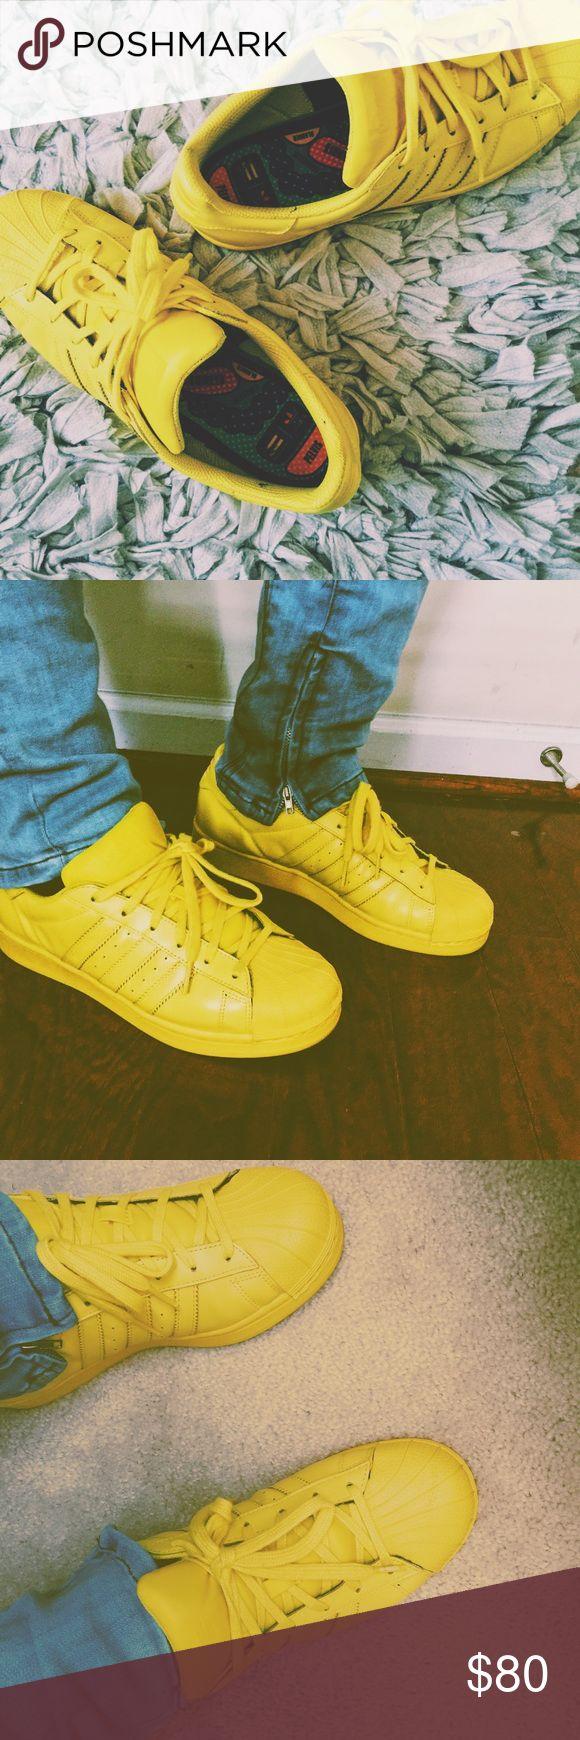 Adidas pharell superstar shell toe yellow